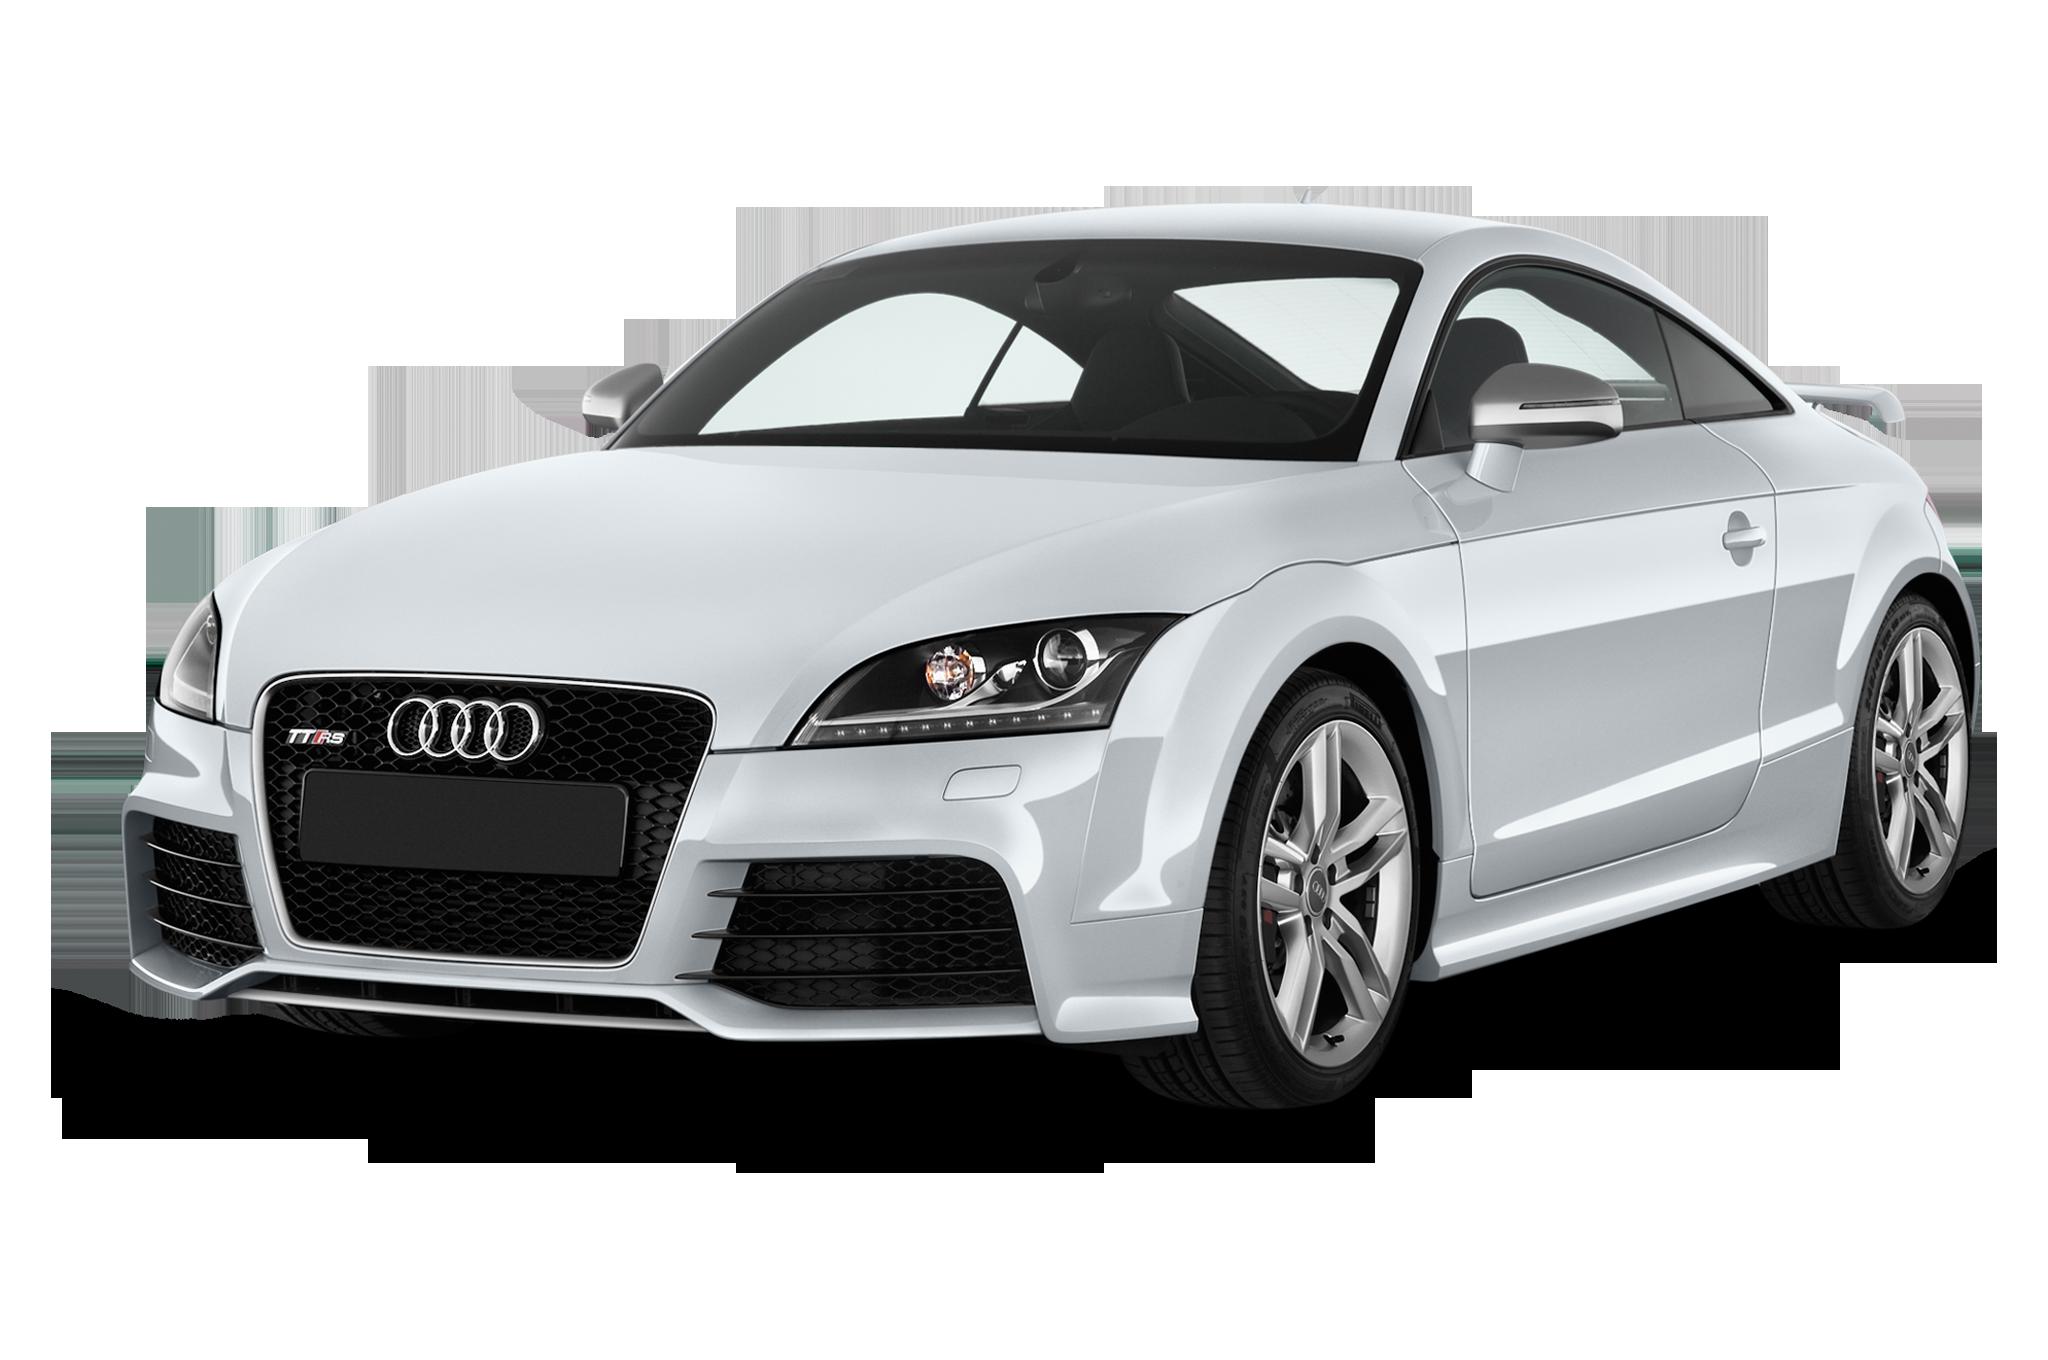 Audi TT (06-14) (8J)